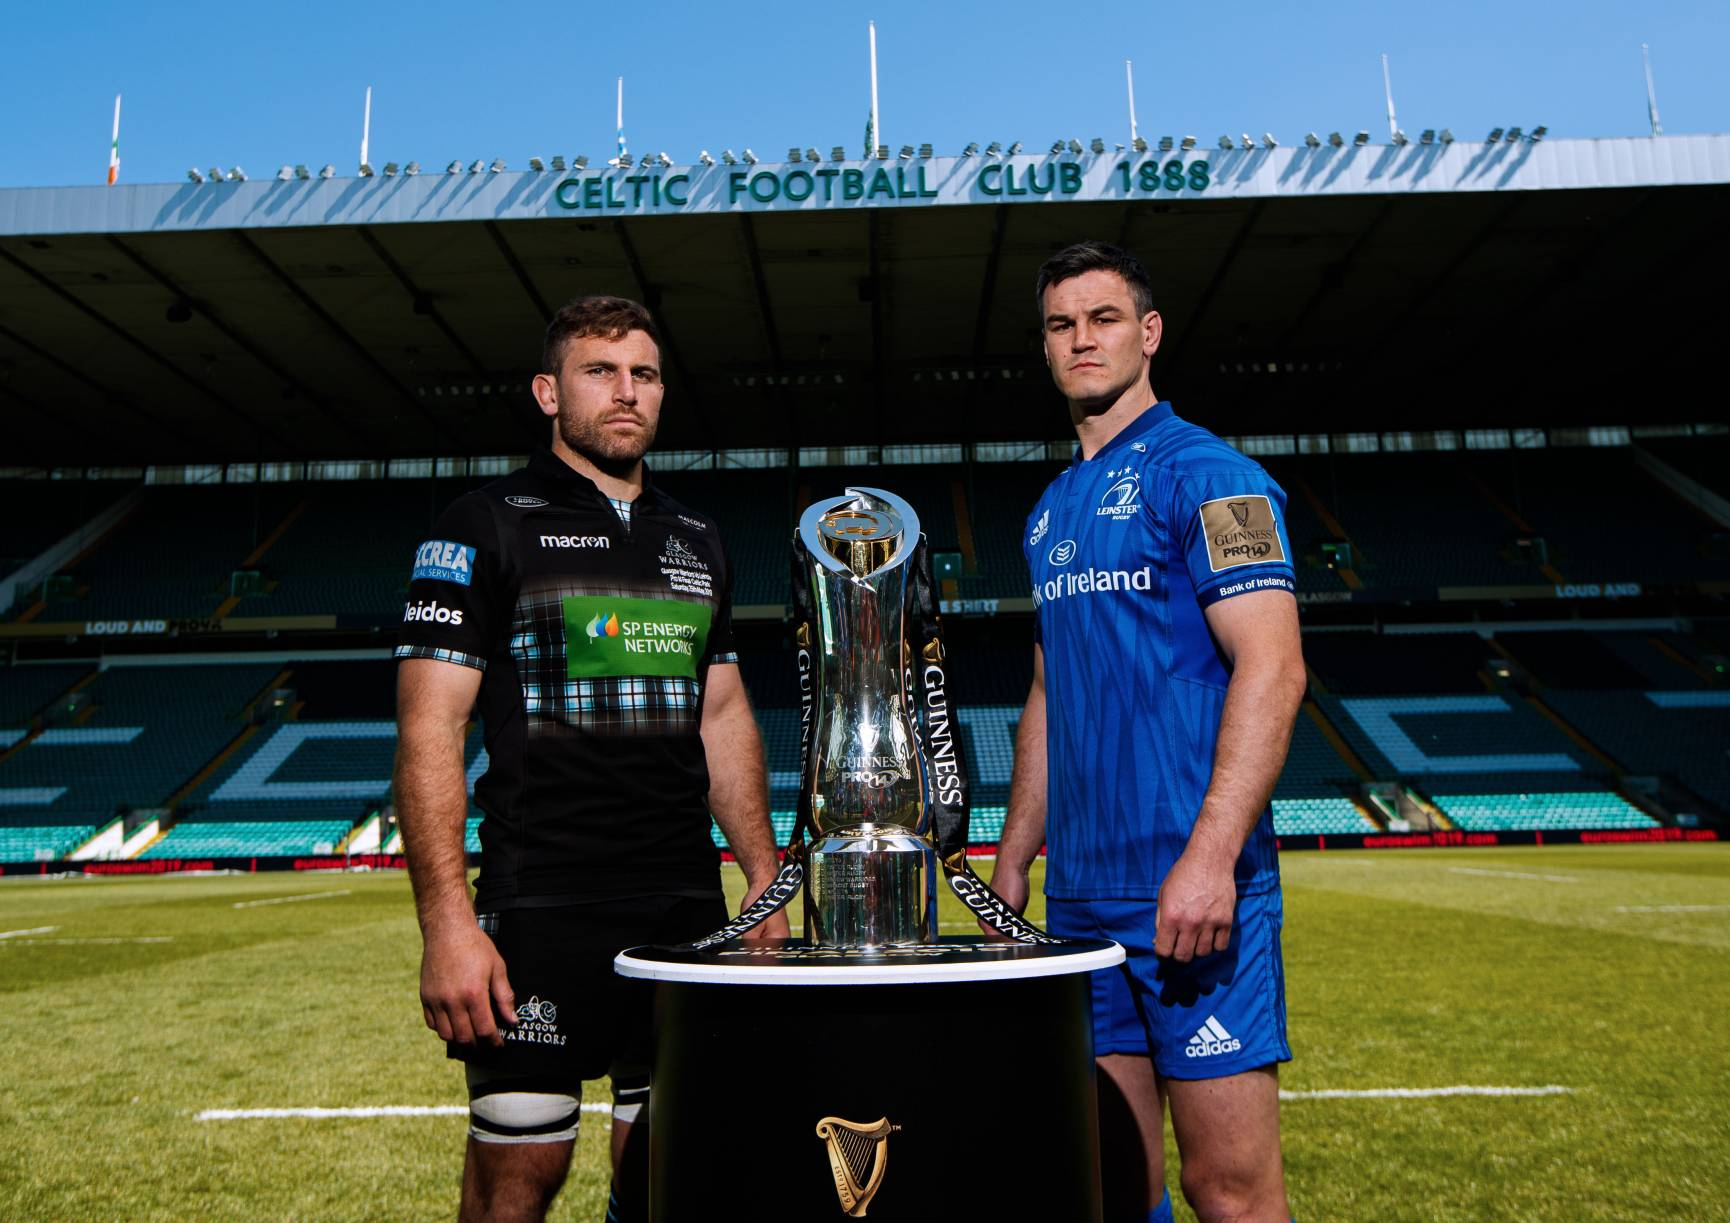 GUINNESS PRO14 Final Preview: Glasgow Warriors v Leinster